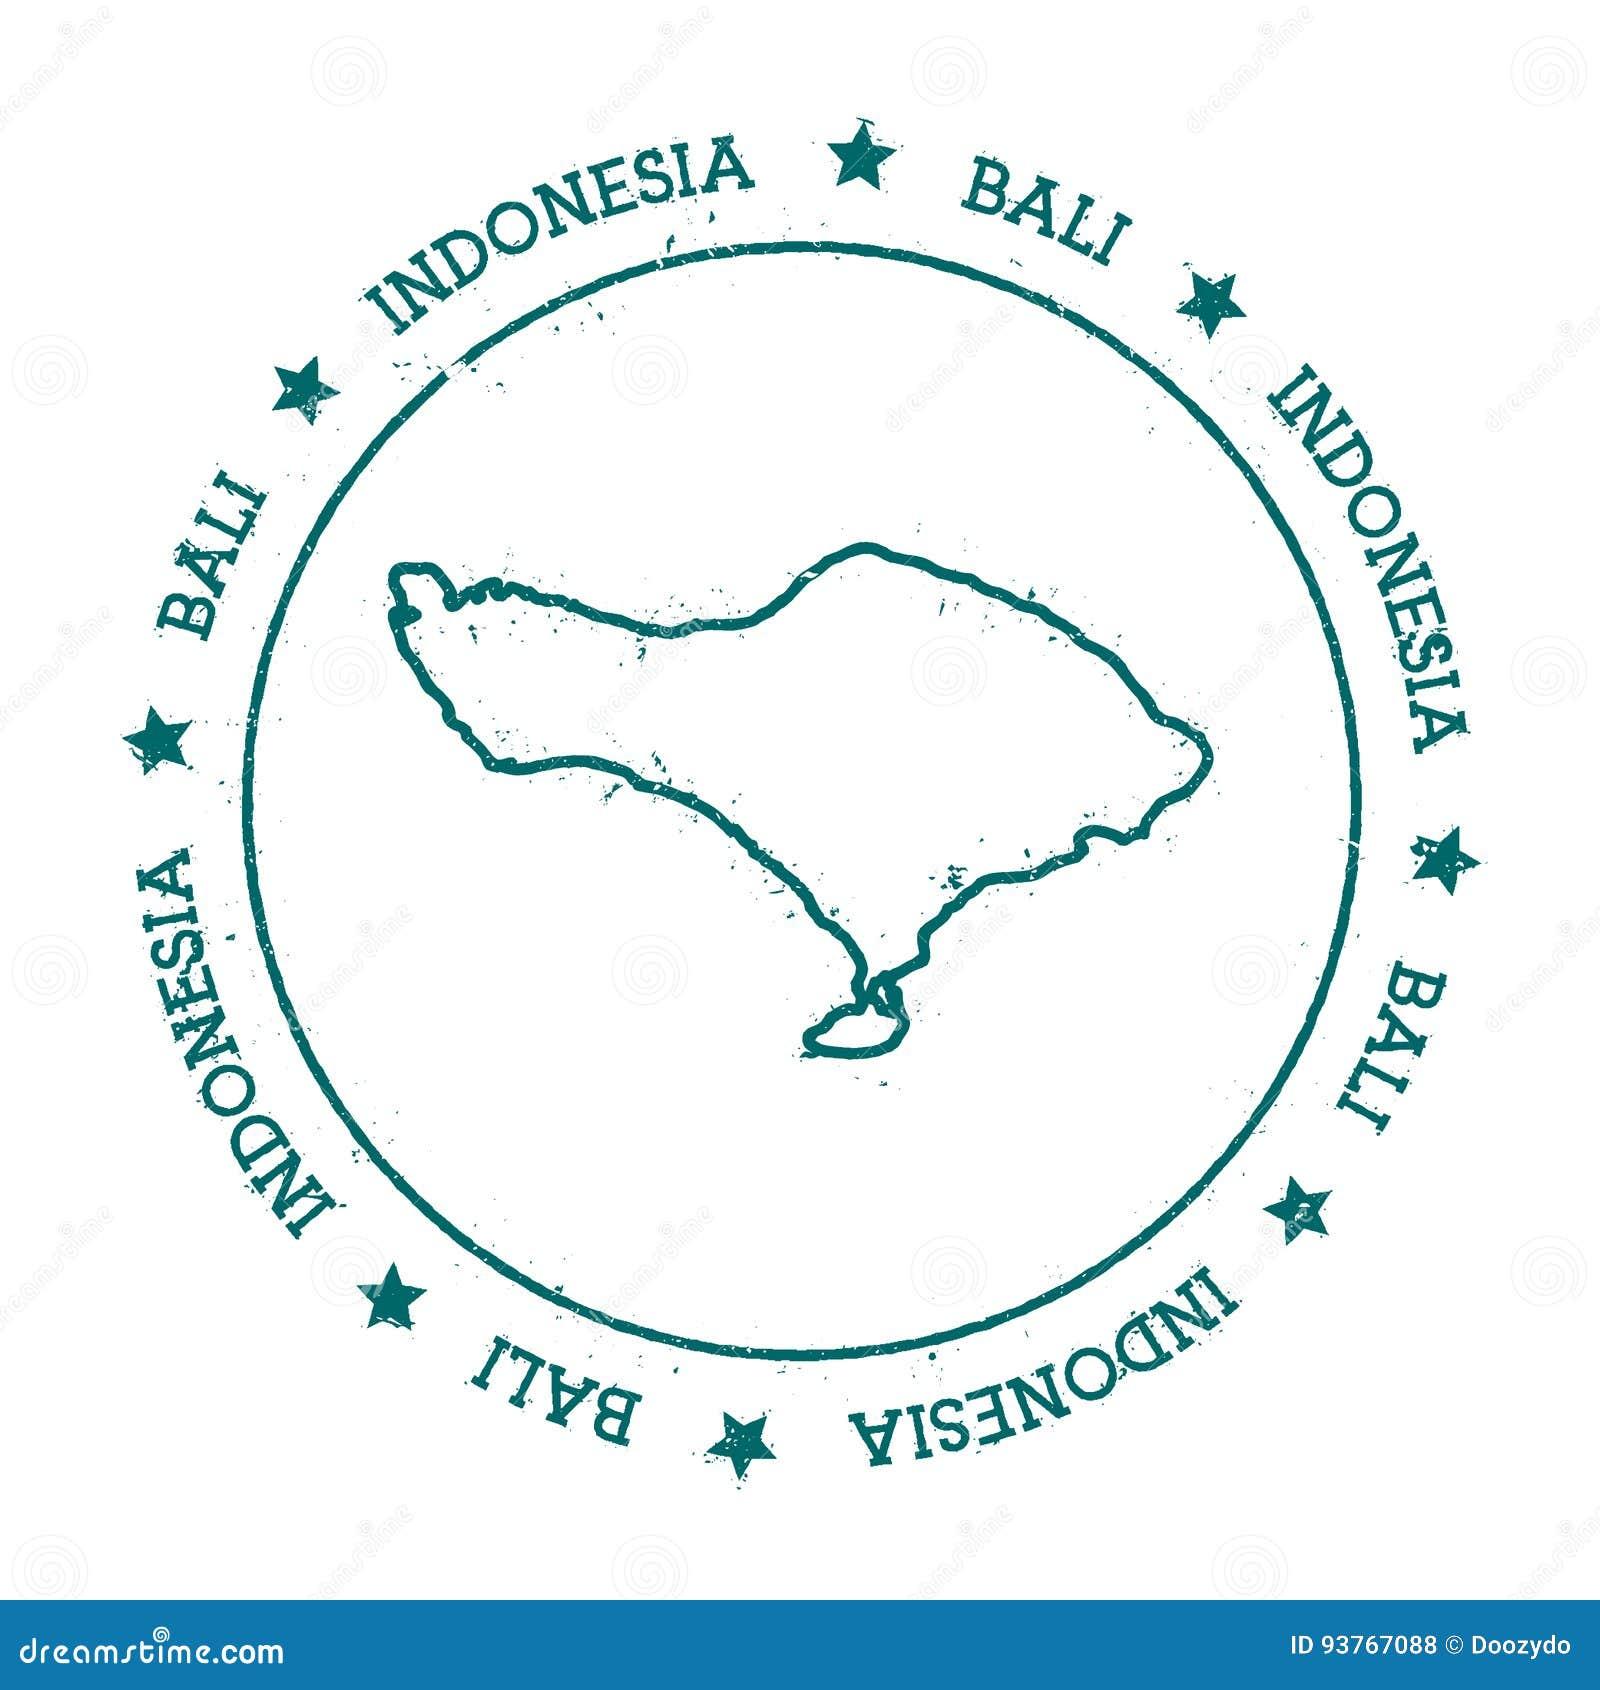 Bali Vector Map Stock Vector Illustration Of Bali Messy 93767088